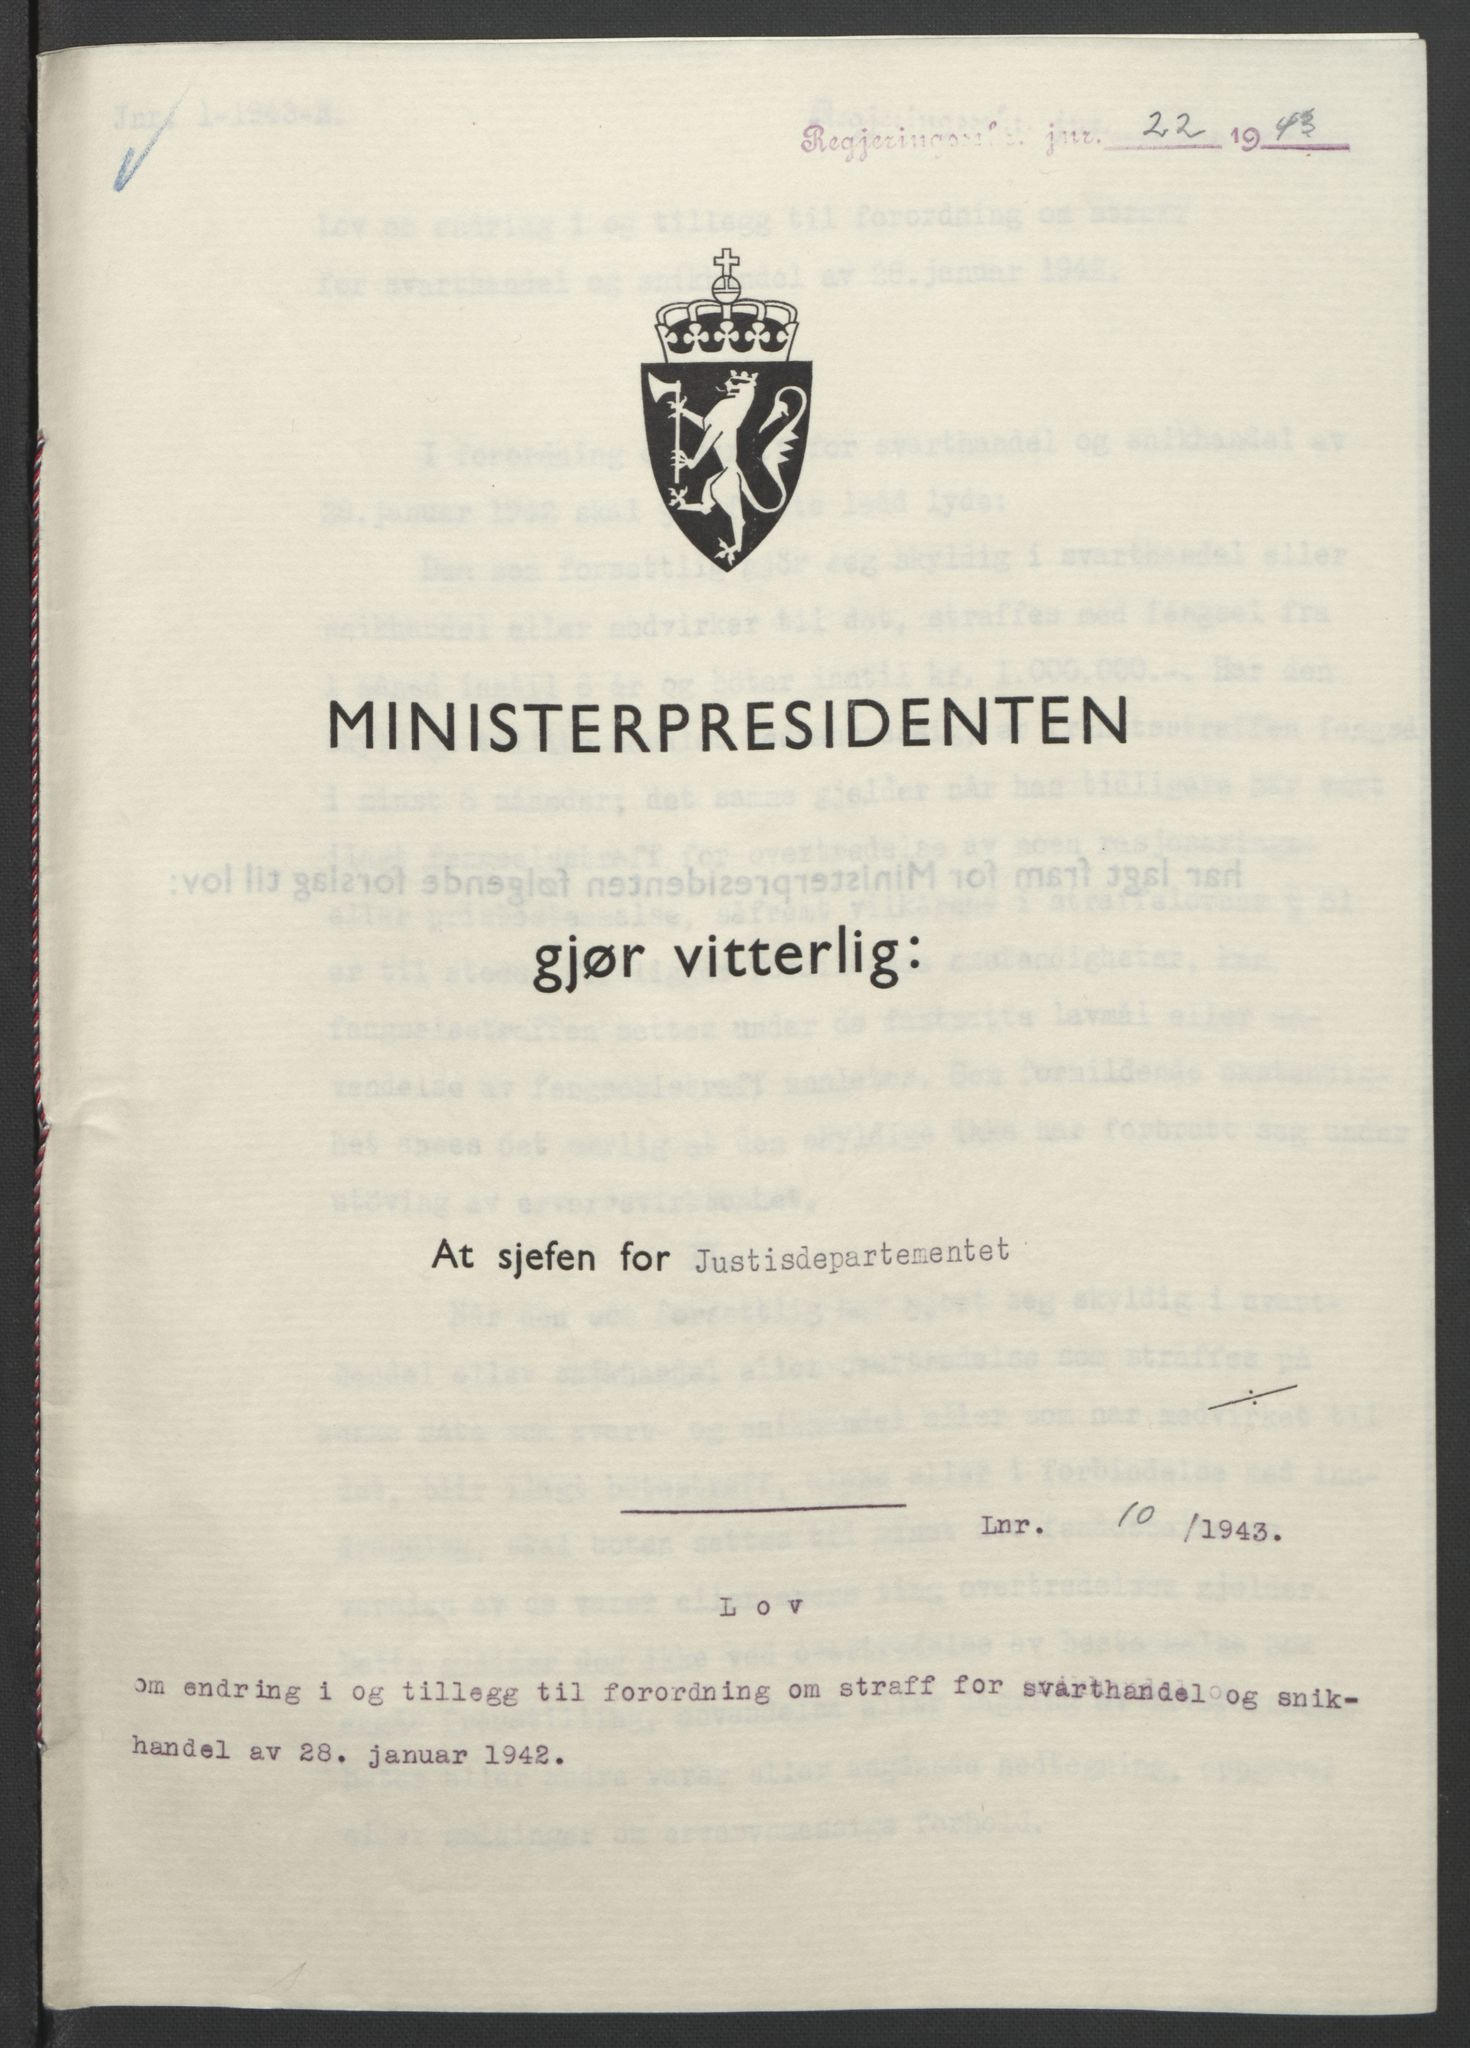 RA, NS-administrasjonen 1940-1945 (Statsrådsekretariatet, de kommisariske statsråder mm), D/Db/L0099: Lover, 1943, s. 40